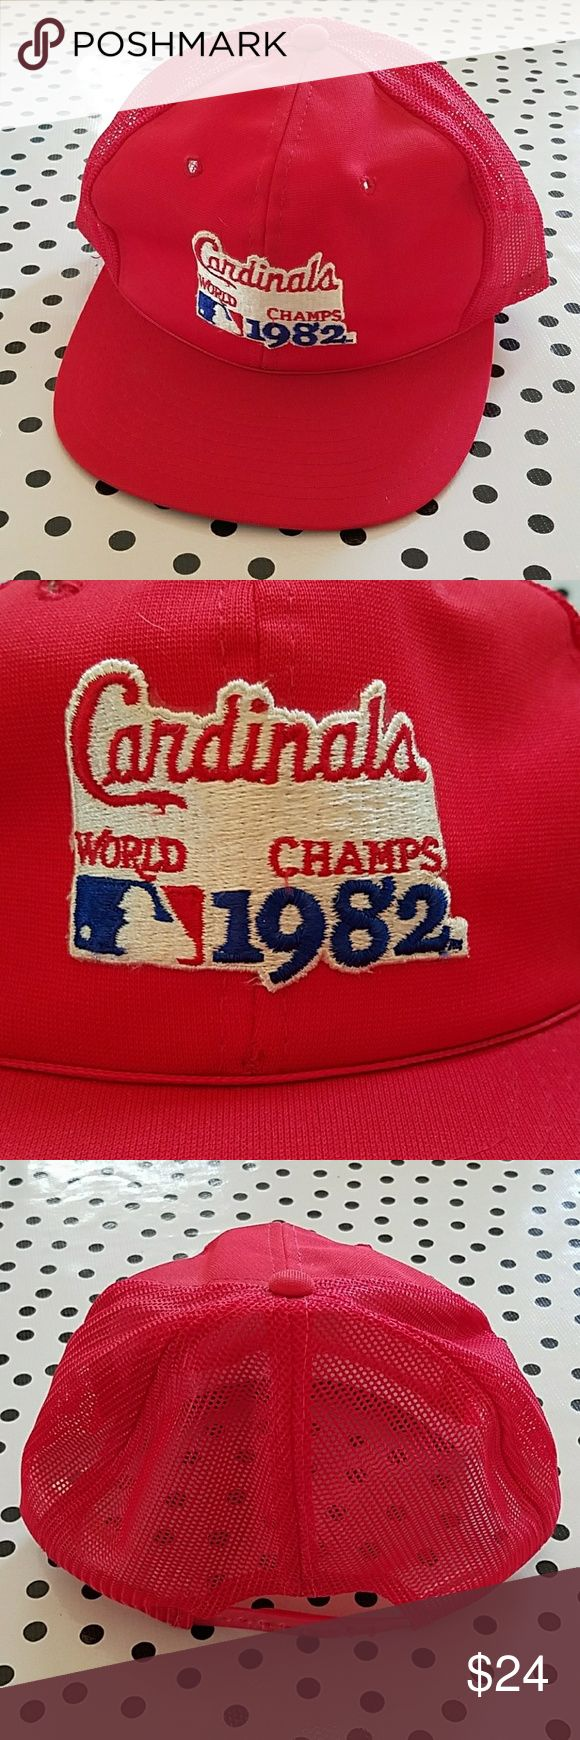 Vintage 1982 St. Louis Cardinals World Series Hat Vintage 1982 St. Louis Cardinals World Series Hat. Vintage trucker snap back. Perfect condition! Vintage Accessories Hats